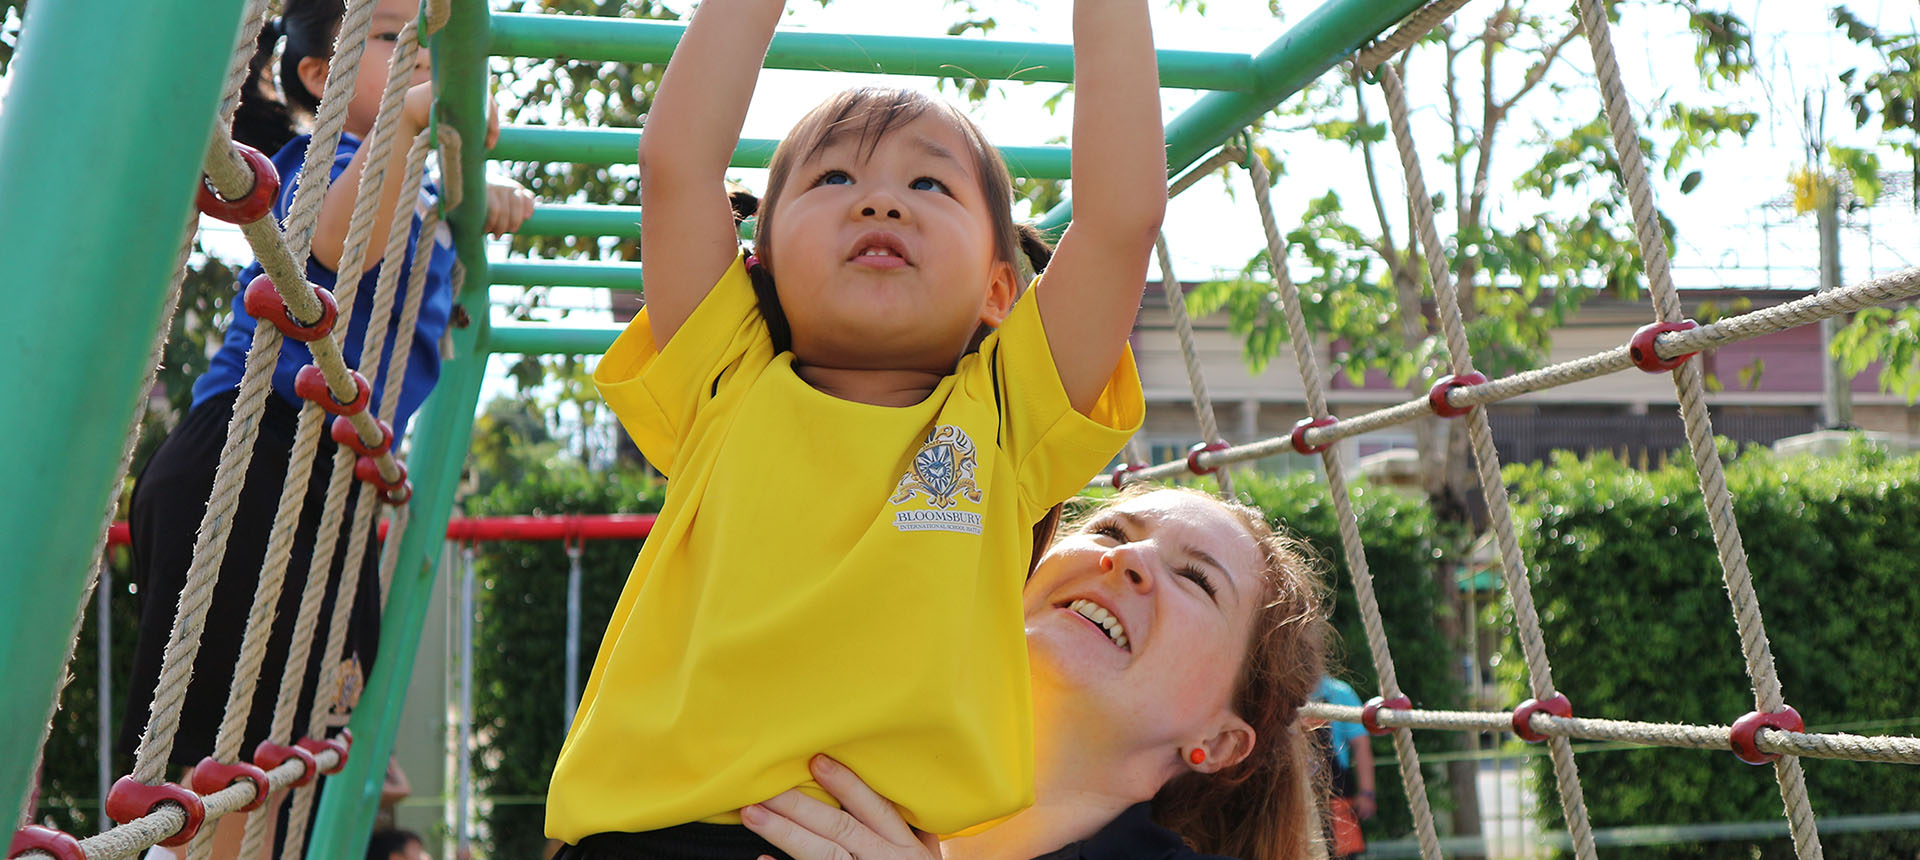 ms-lizz-bentley-playground